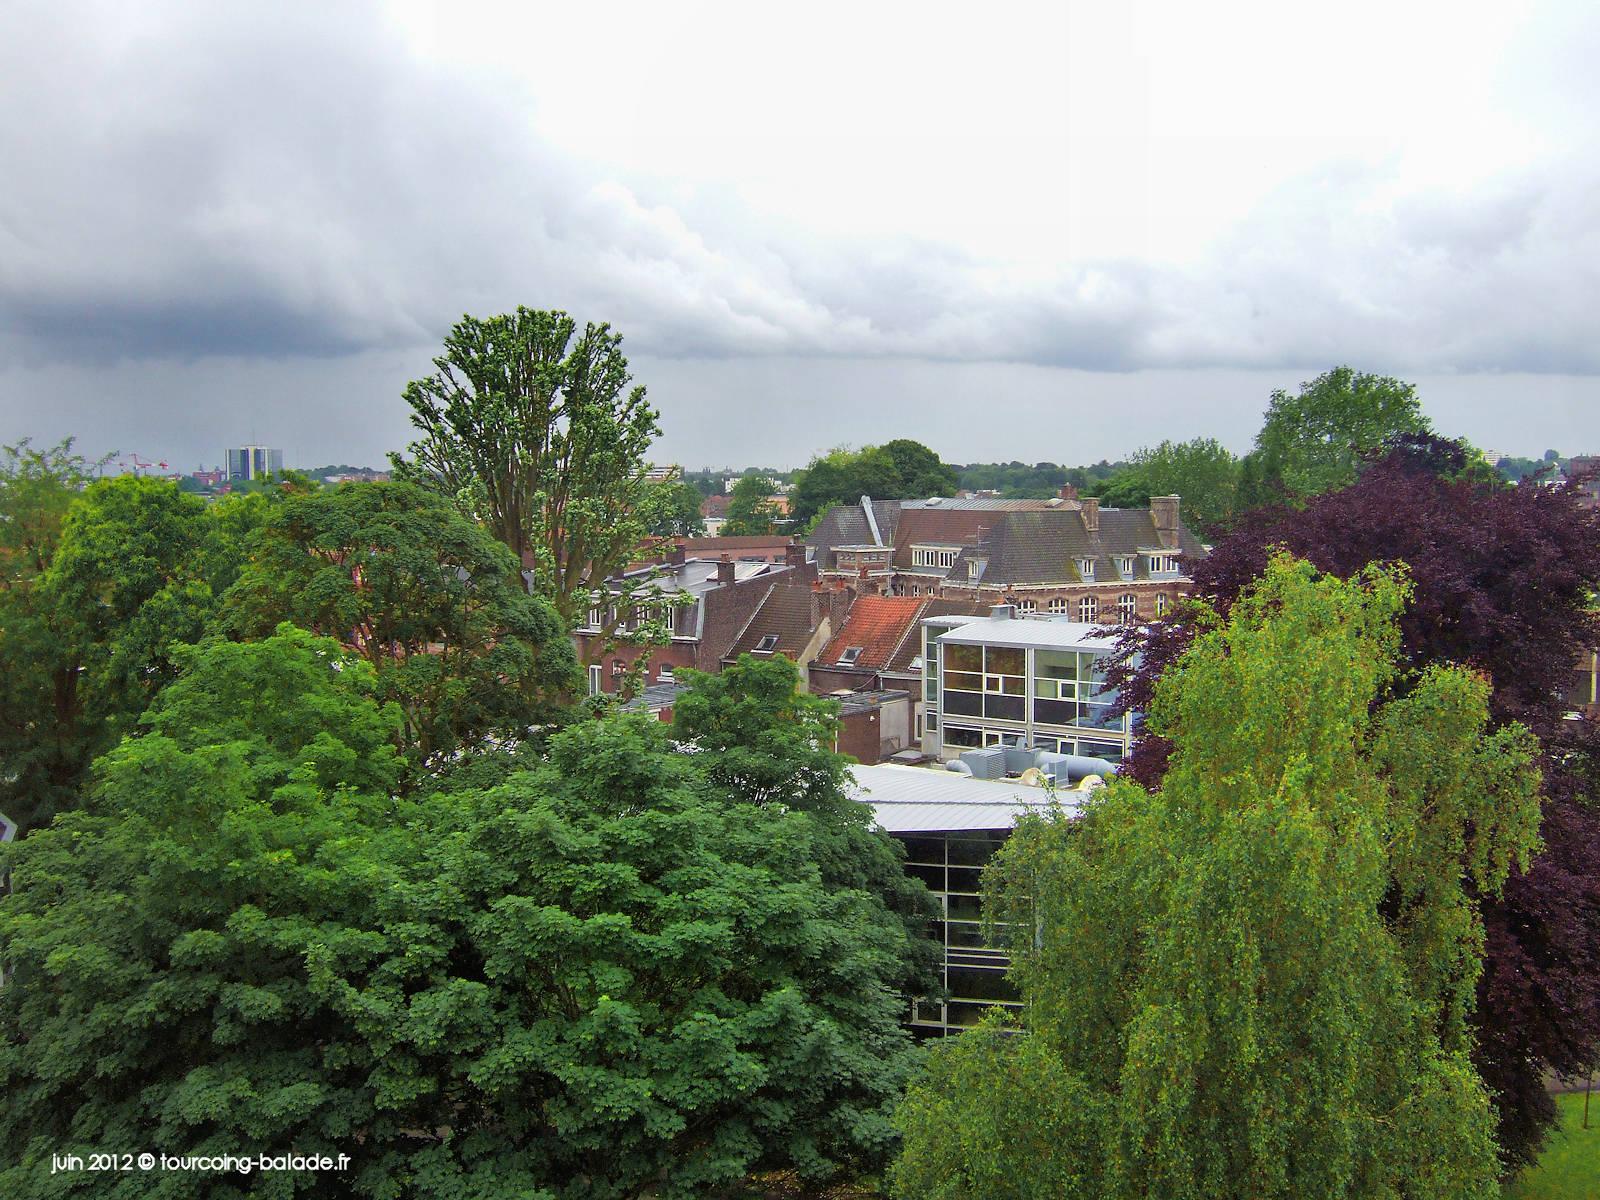 panorama de Tourcoing 2012 - Depuis le Lycée EIC.